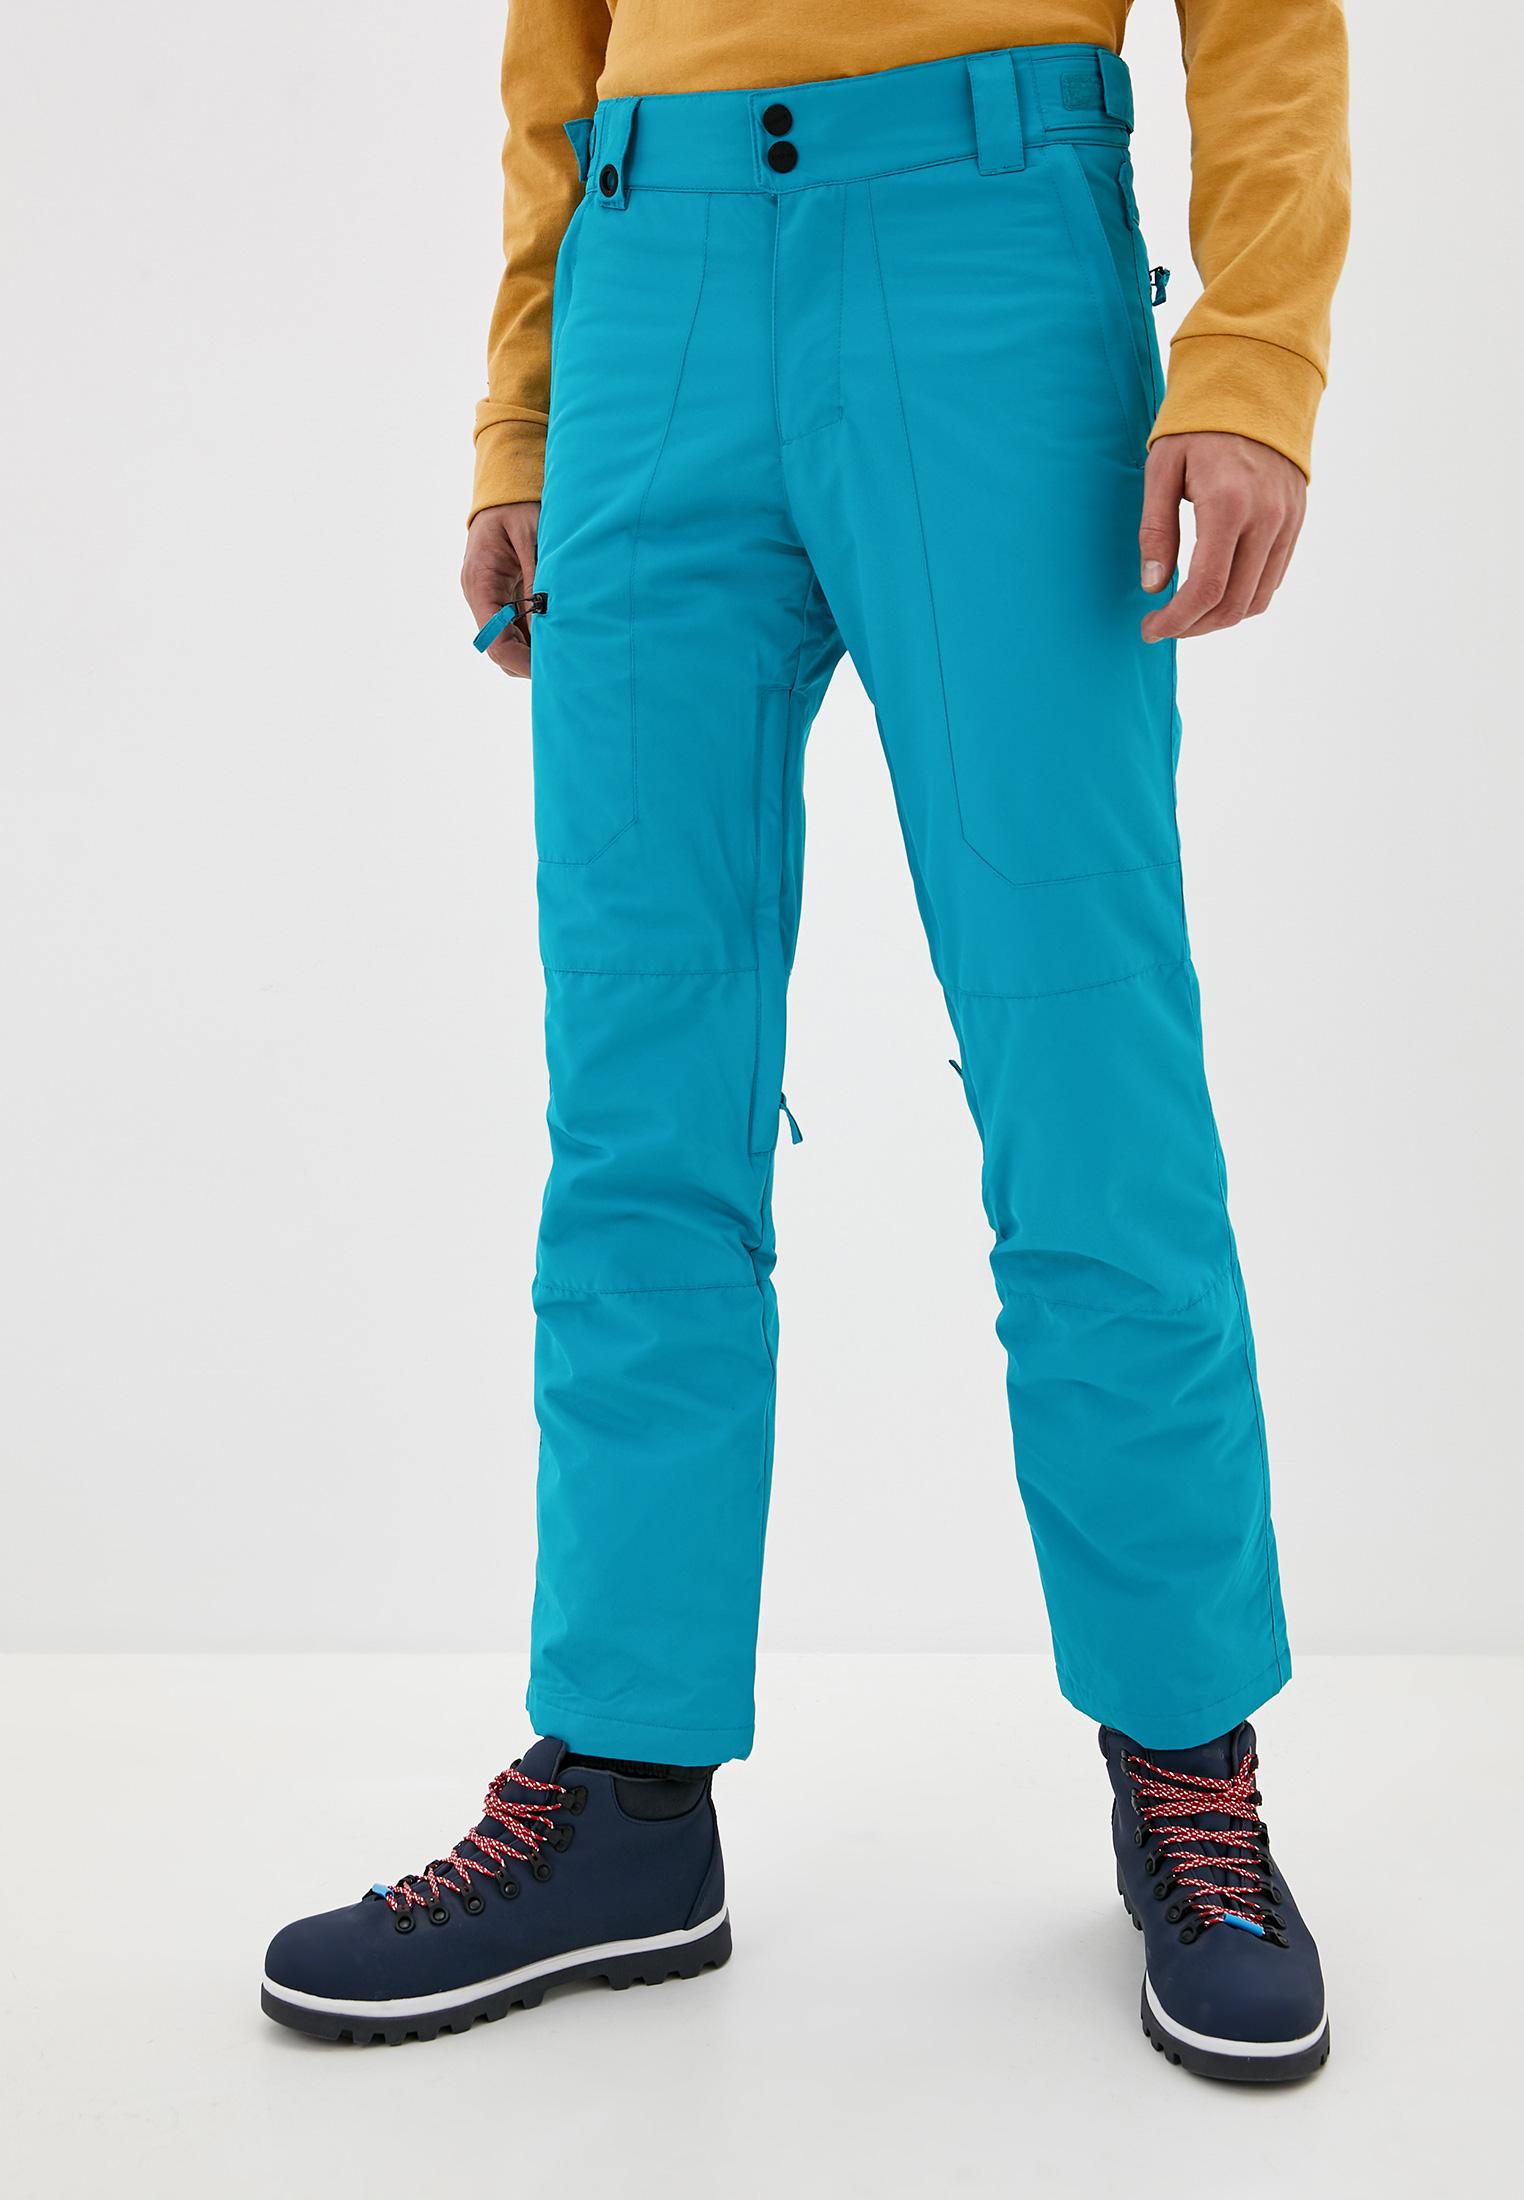 Мужские брюки Termit 100863